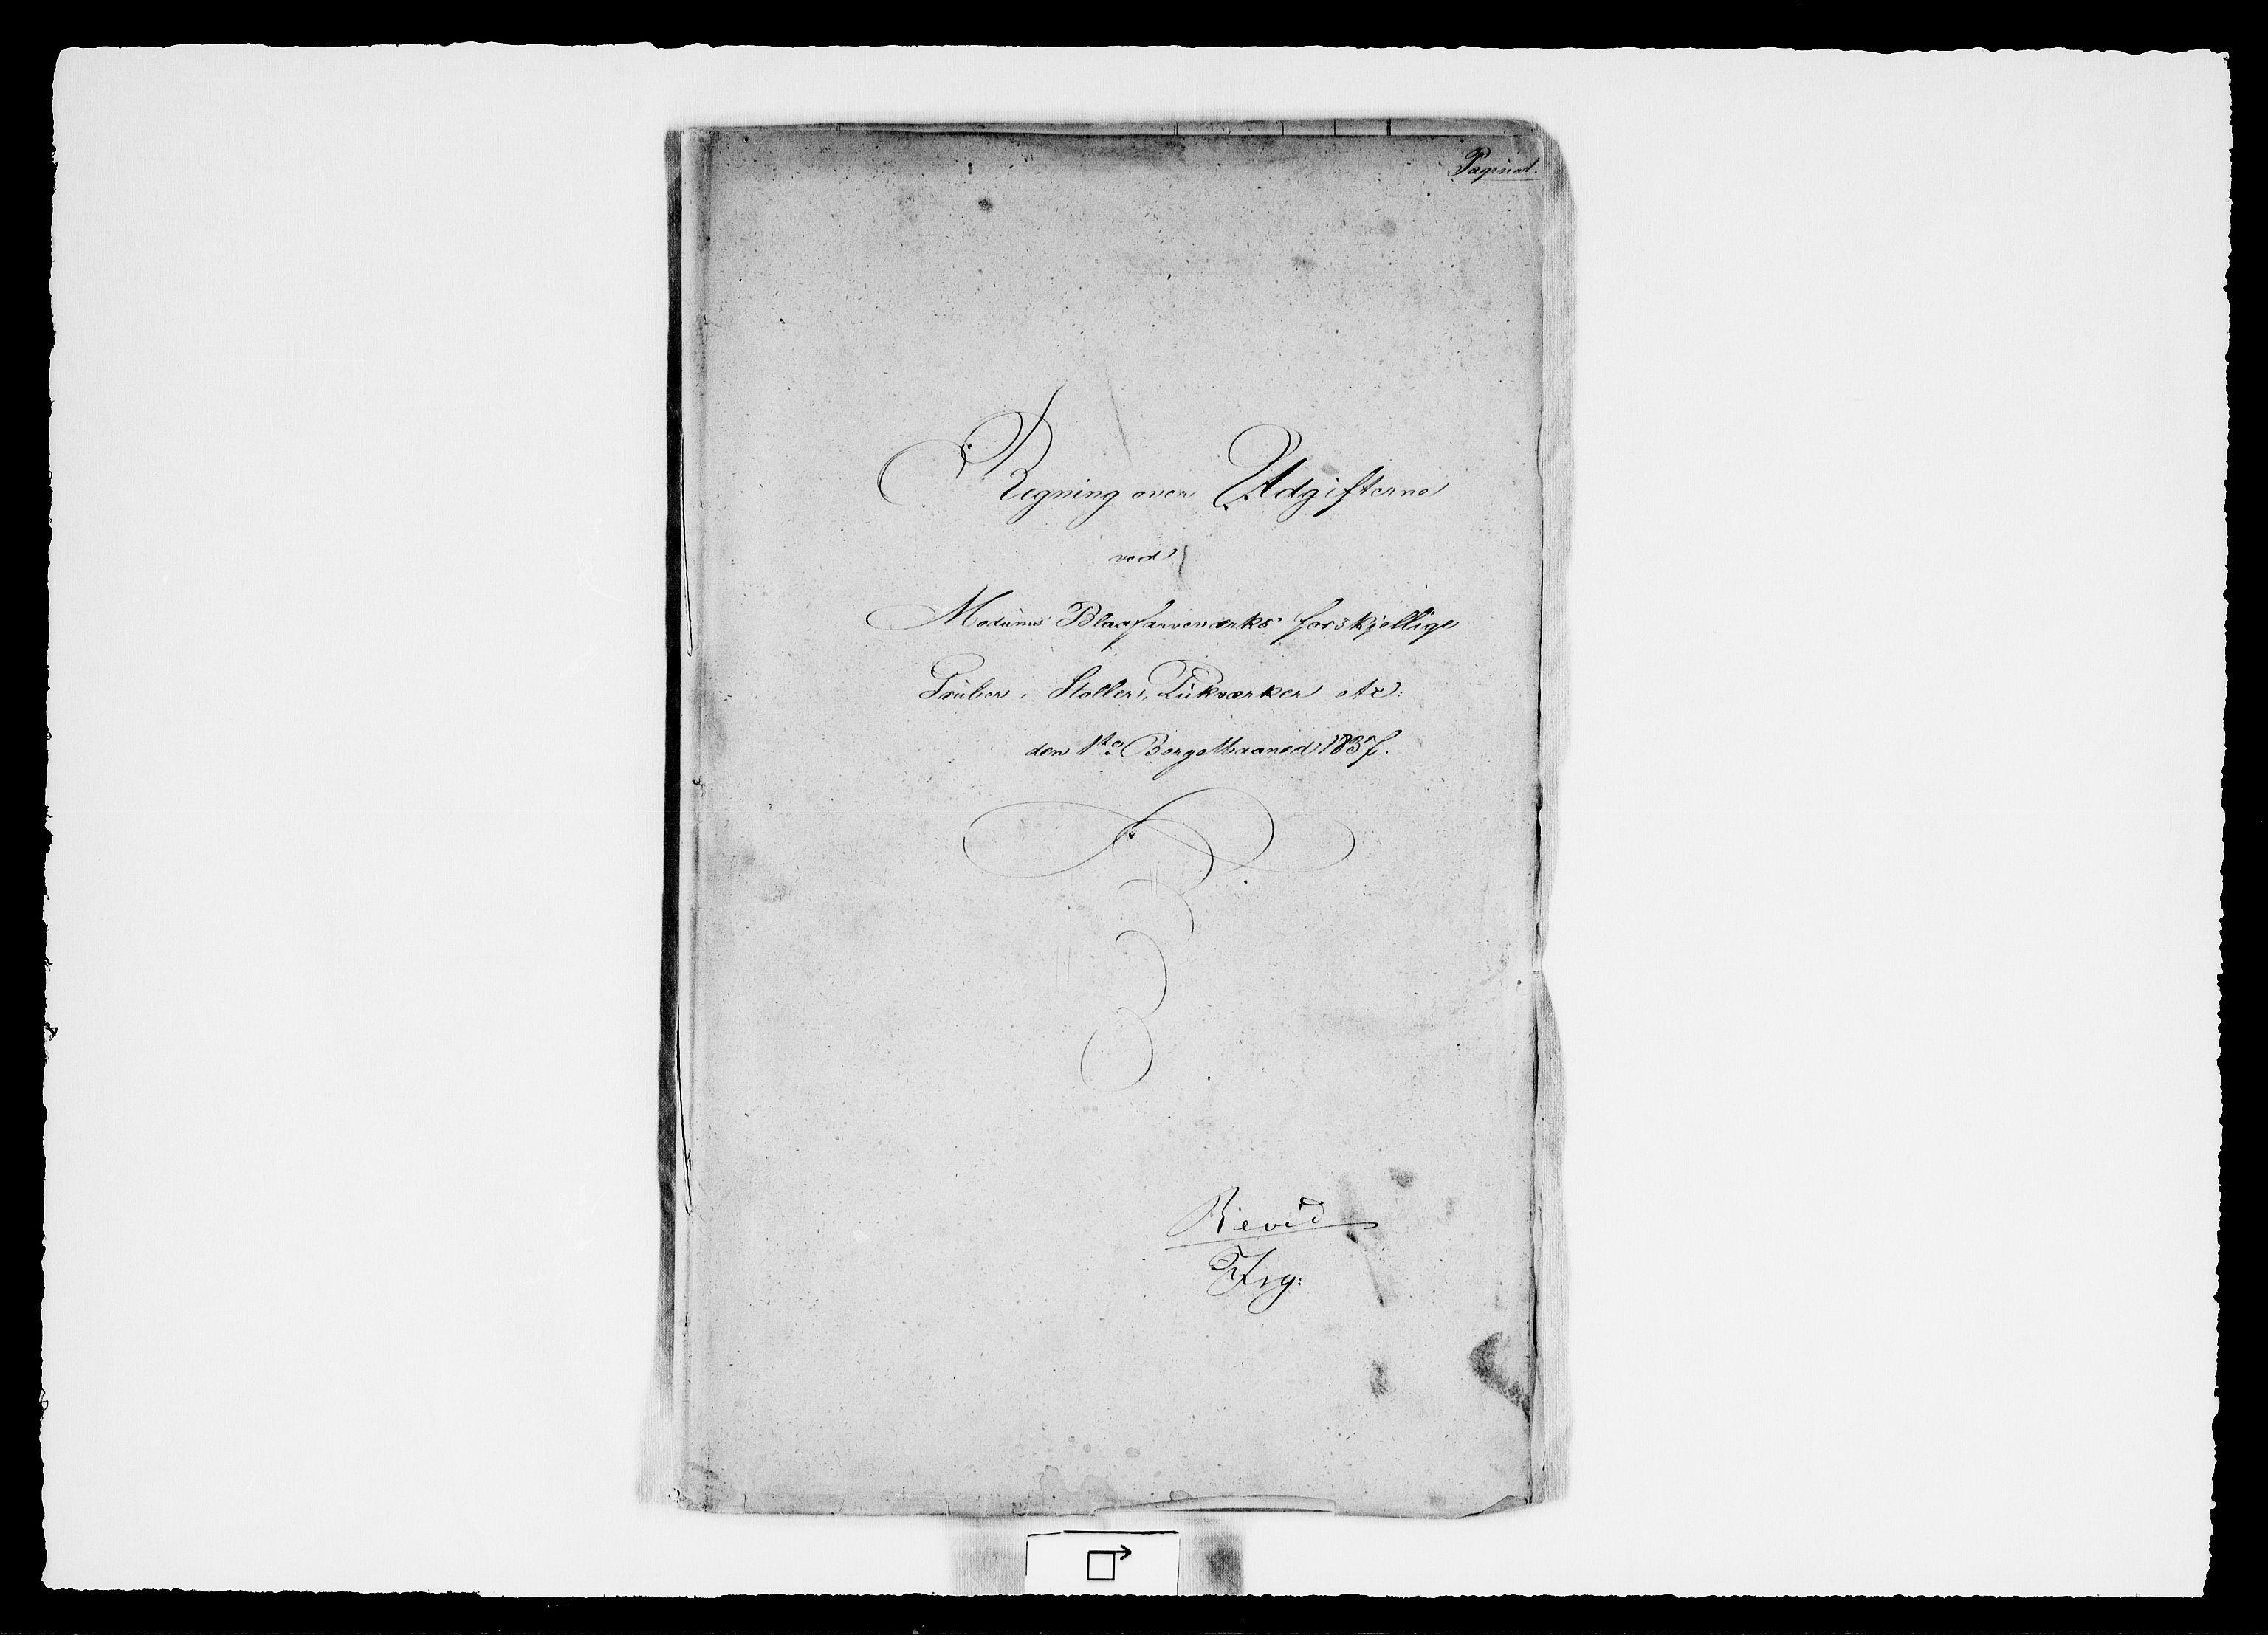 RA, Modums Blaafarveværk, G/Gd/Gdd/L0263, 1837, s. 2